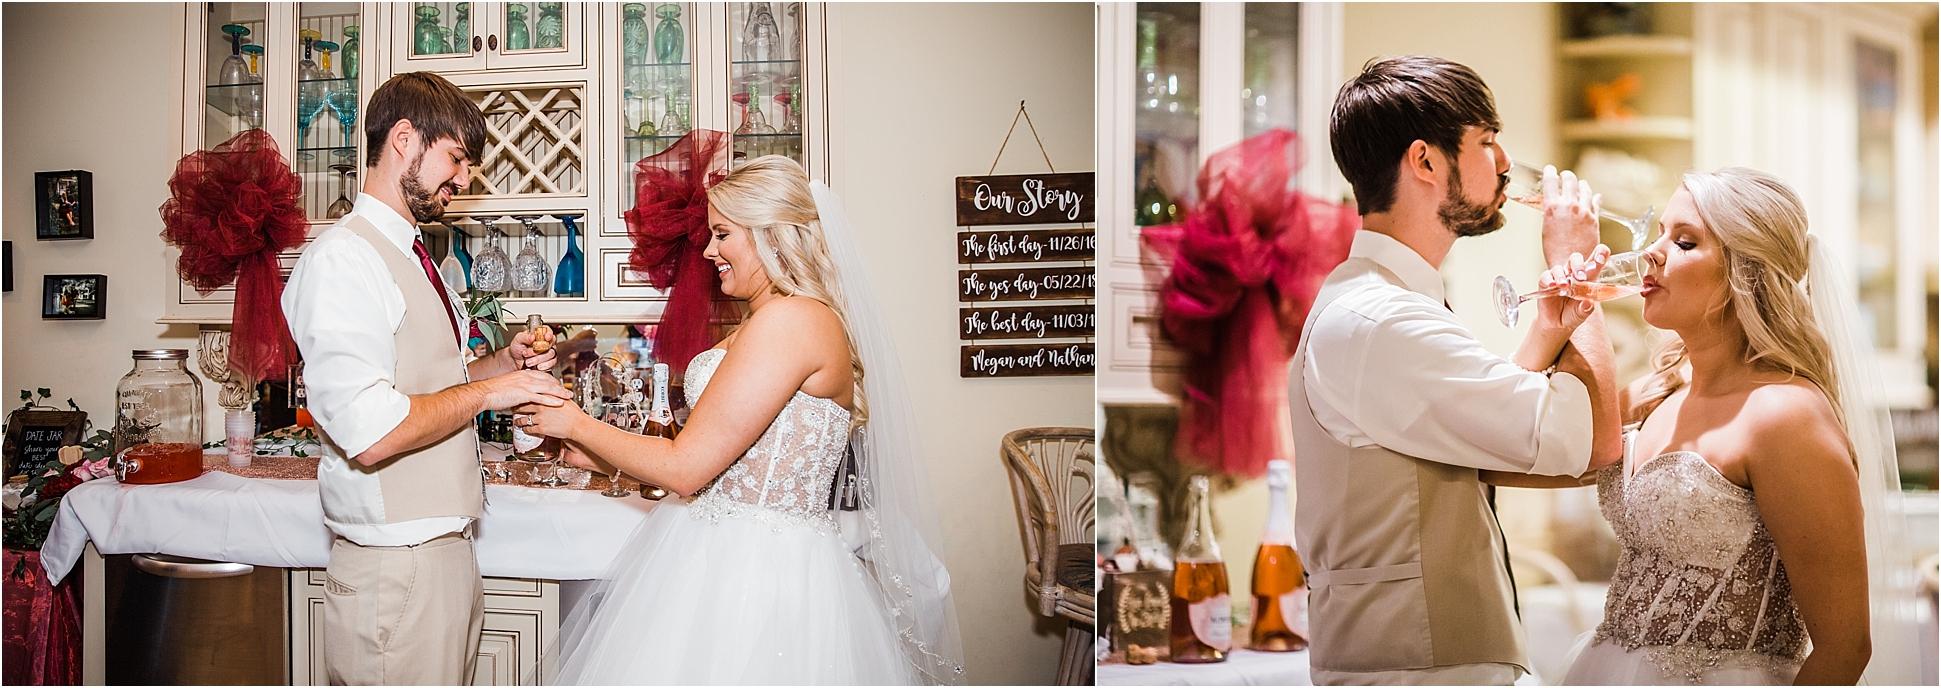 Paradise Beach Weddings in Pensacola